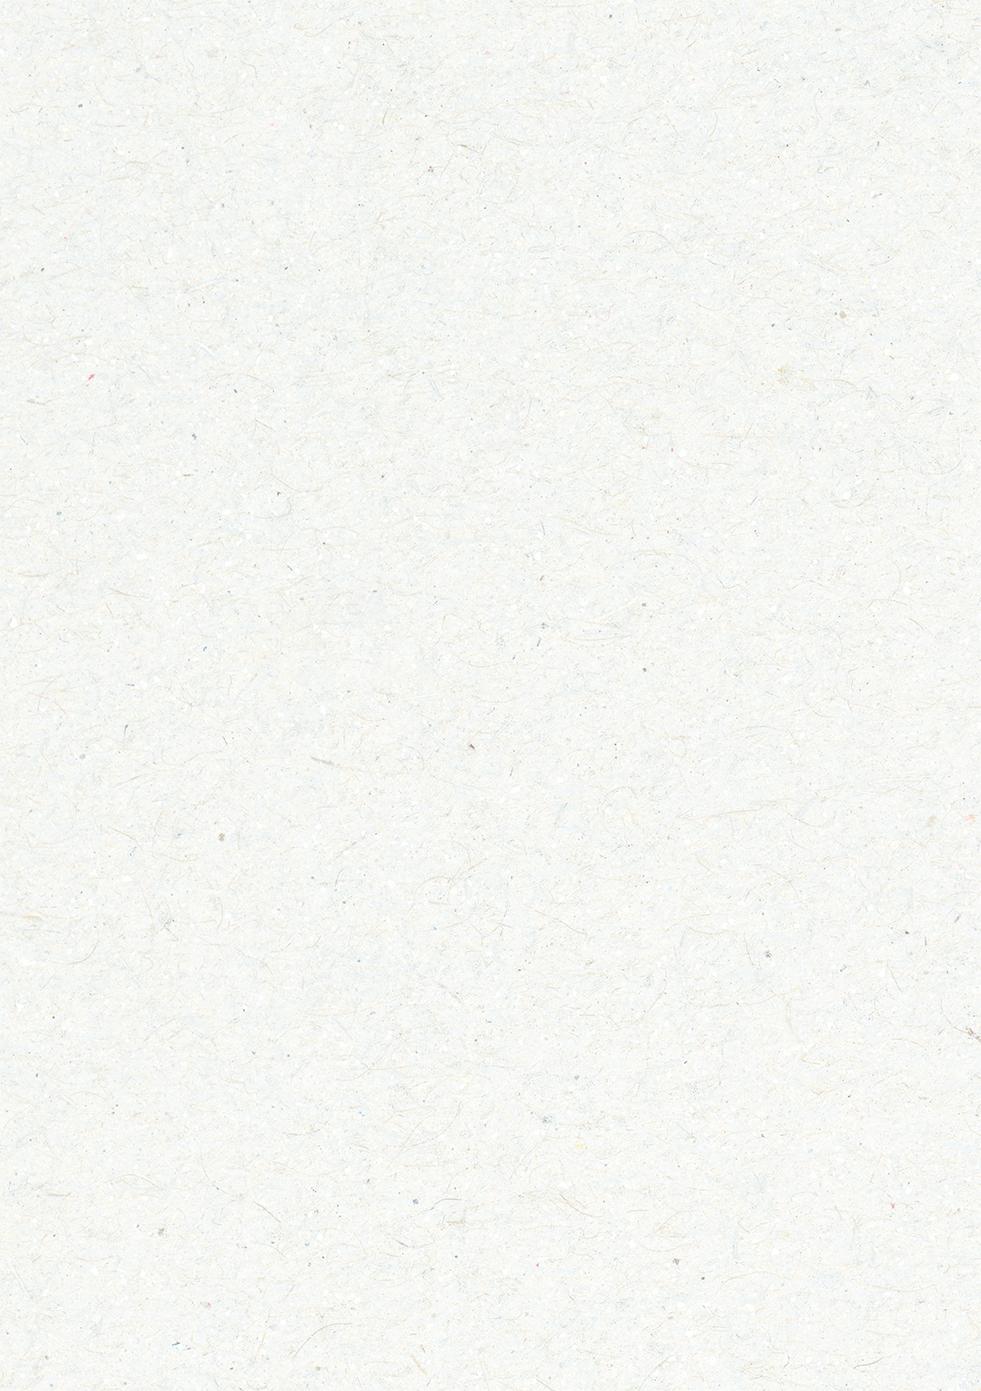 papel_textura.png